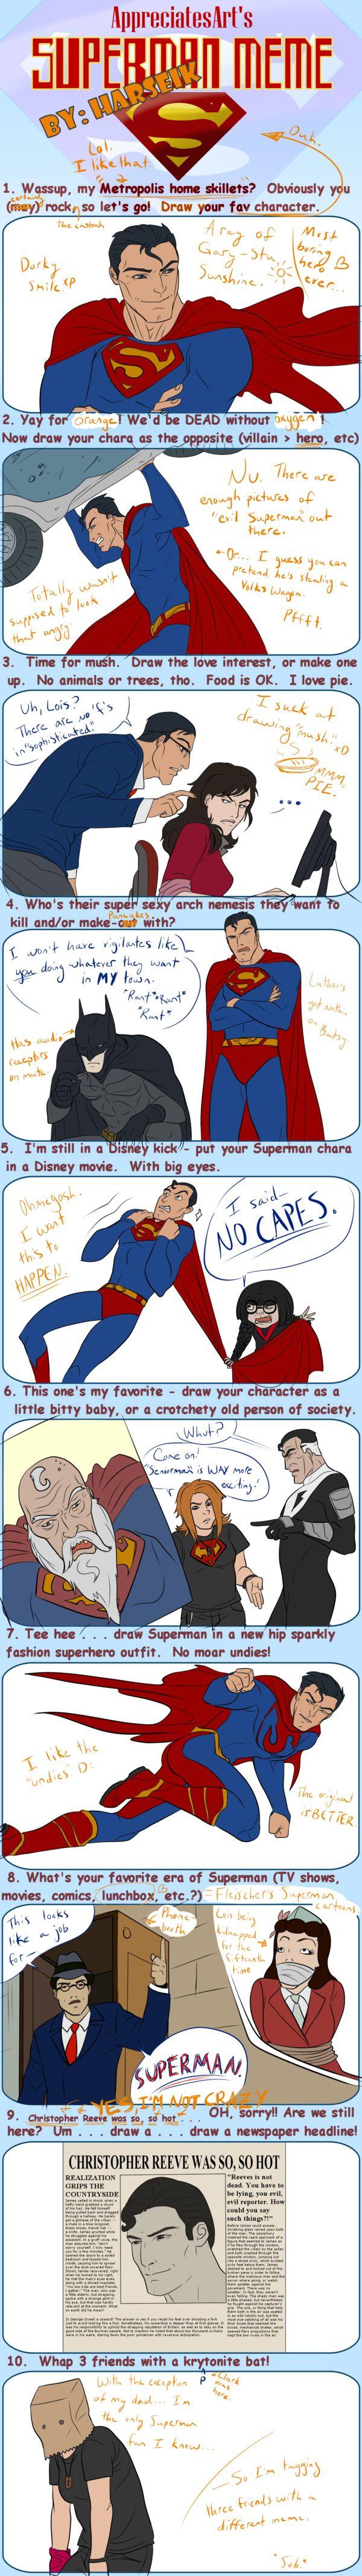 Superman Meme by Harseik by Harseik